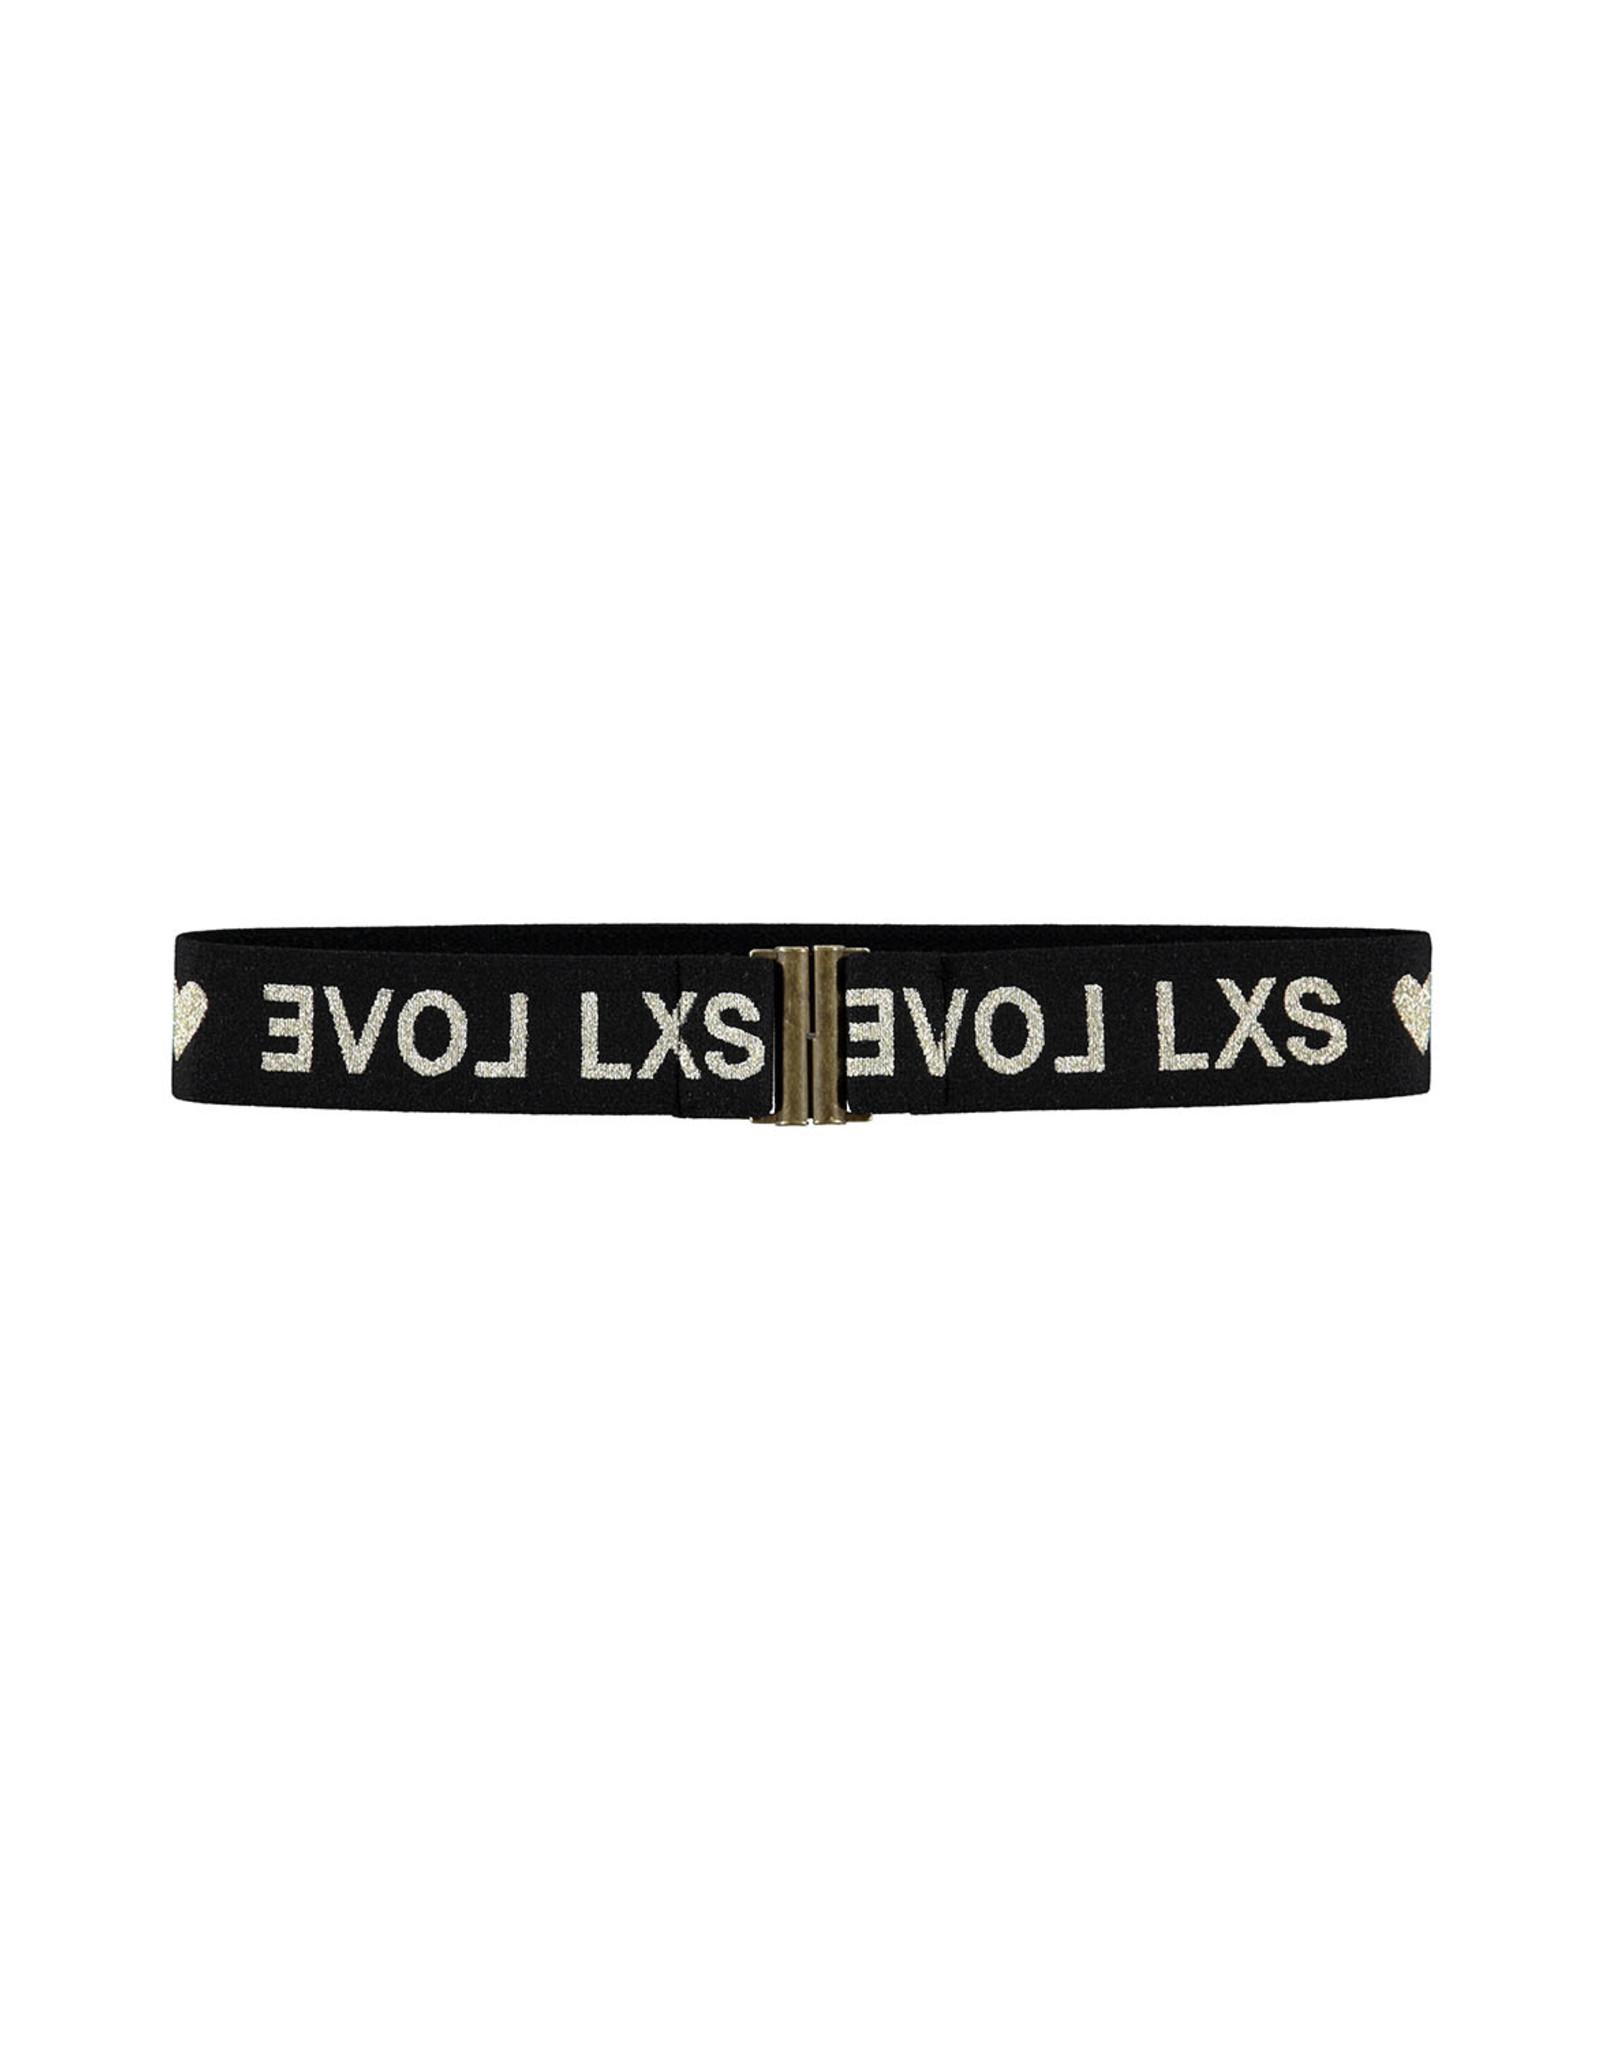 LOOXS 10sixteen elastic belt black